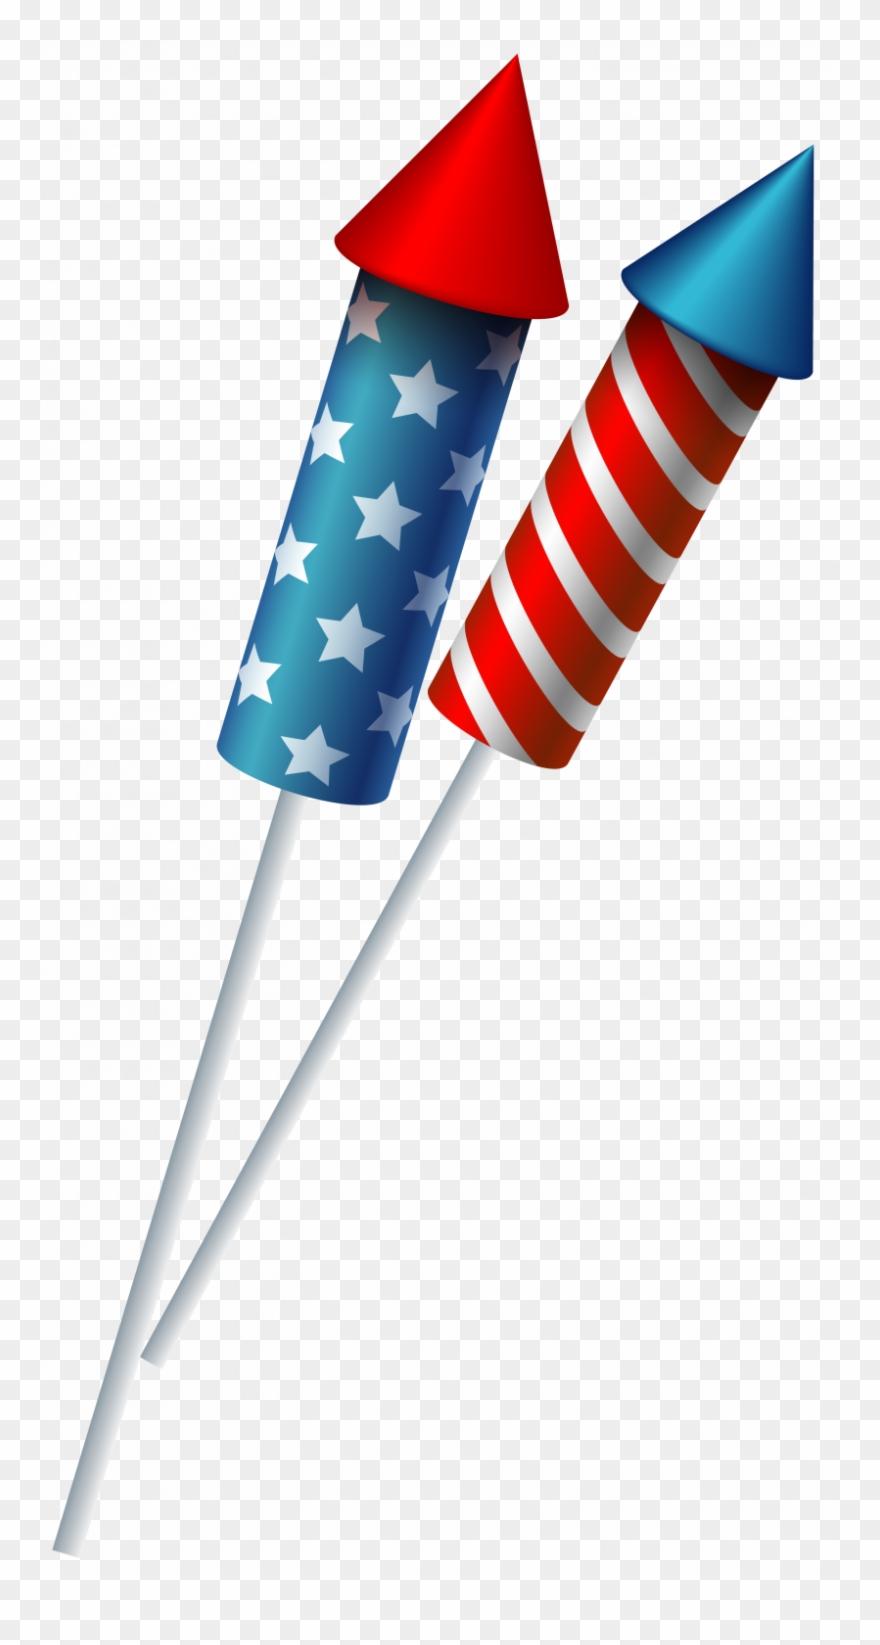 Firework Clipart Rocket Flag.